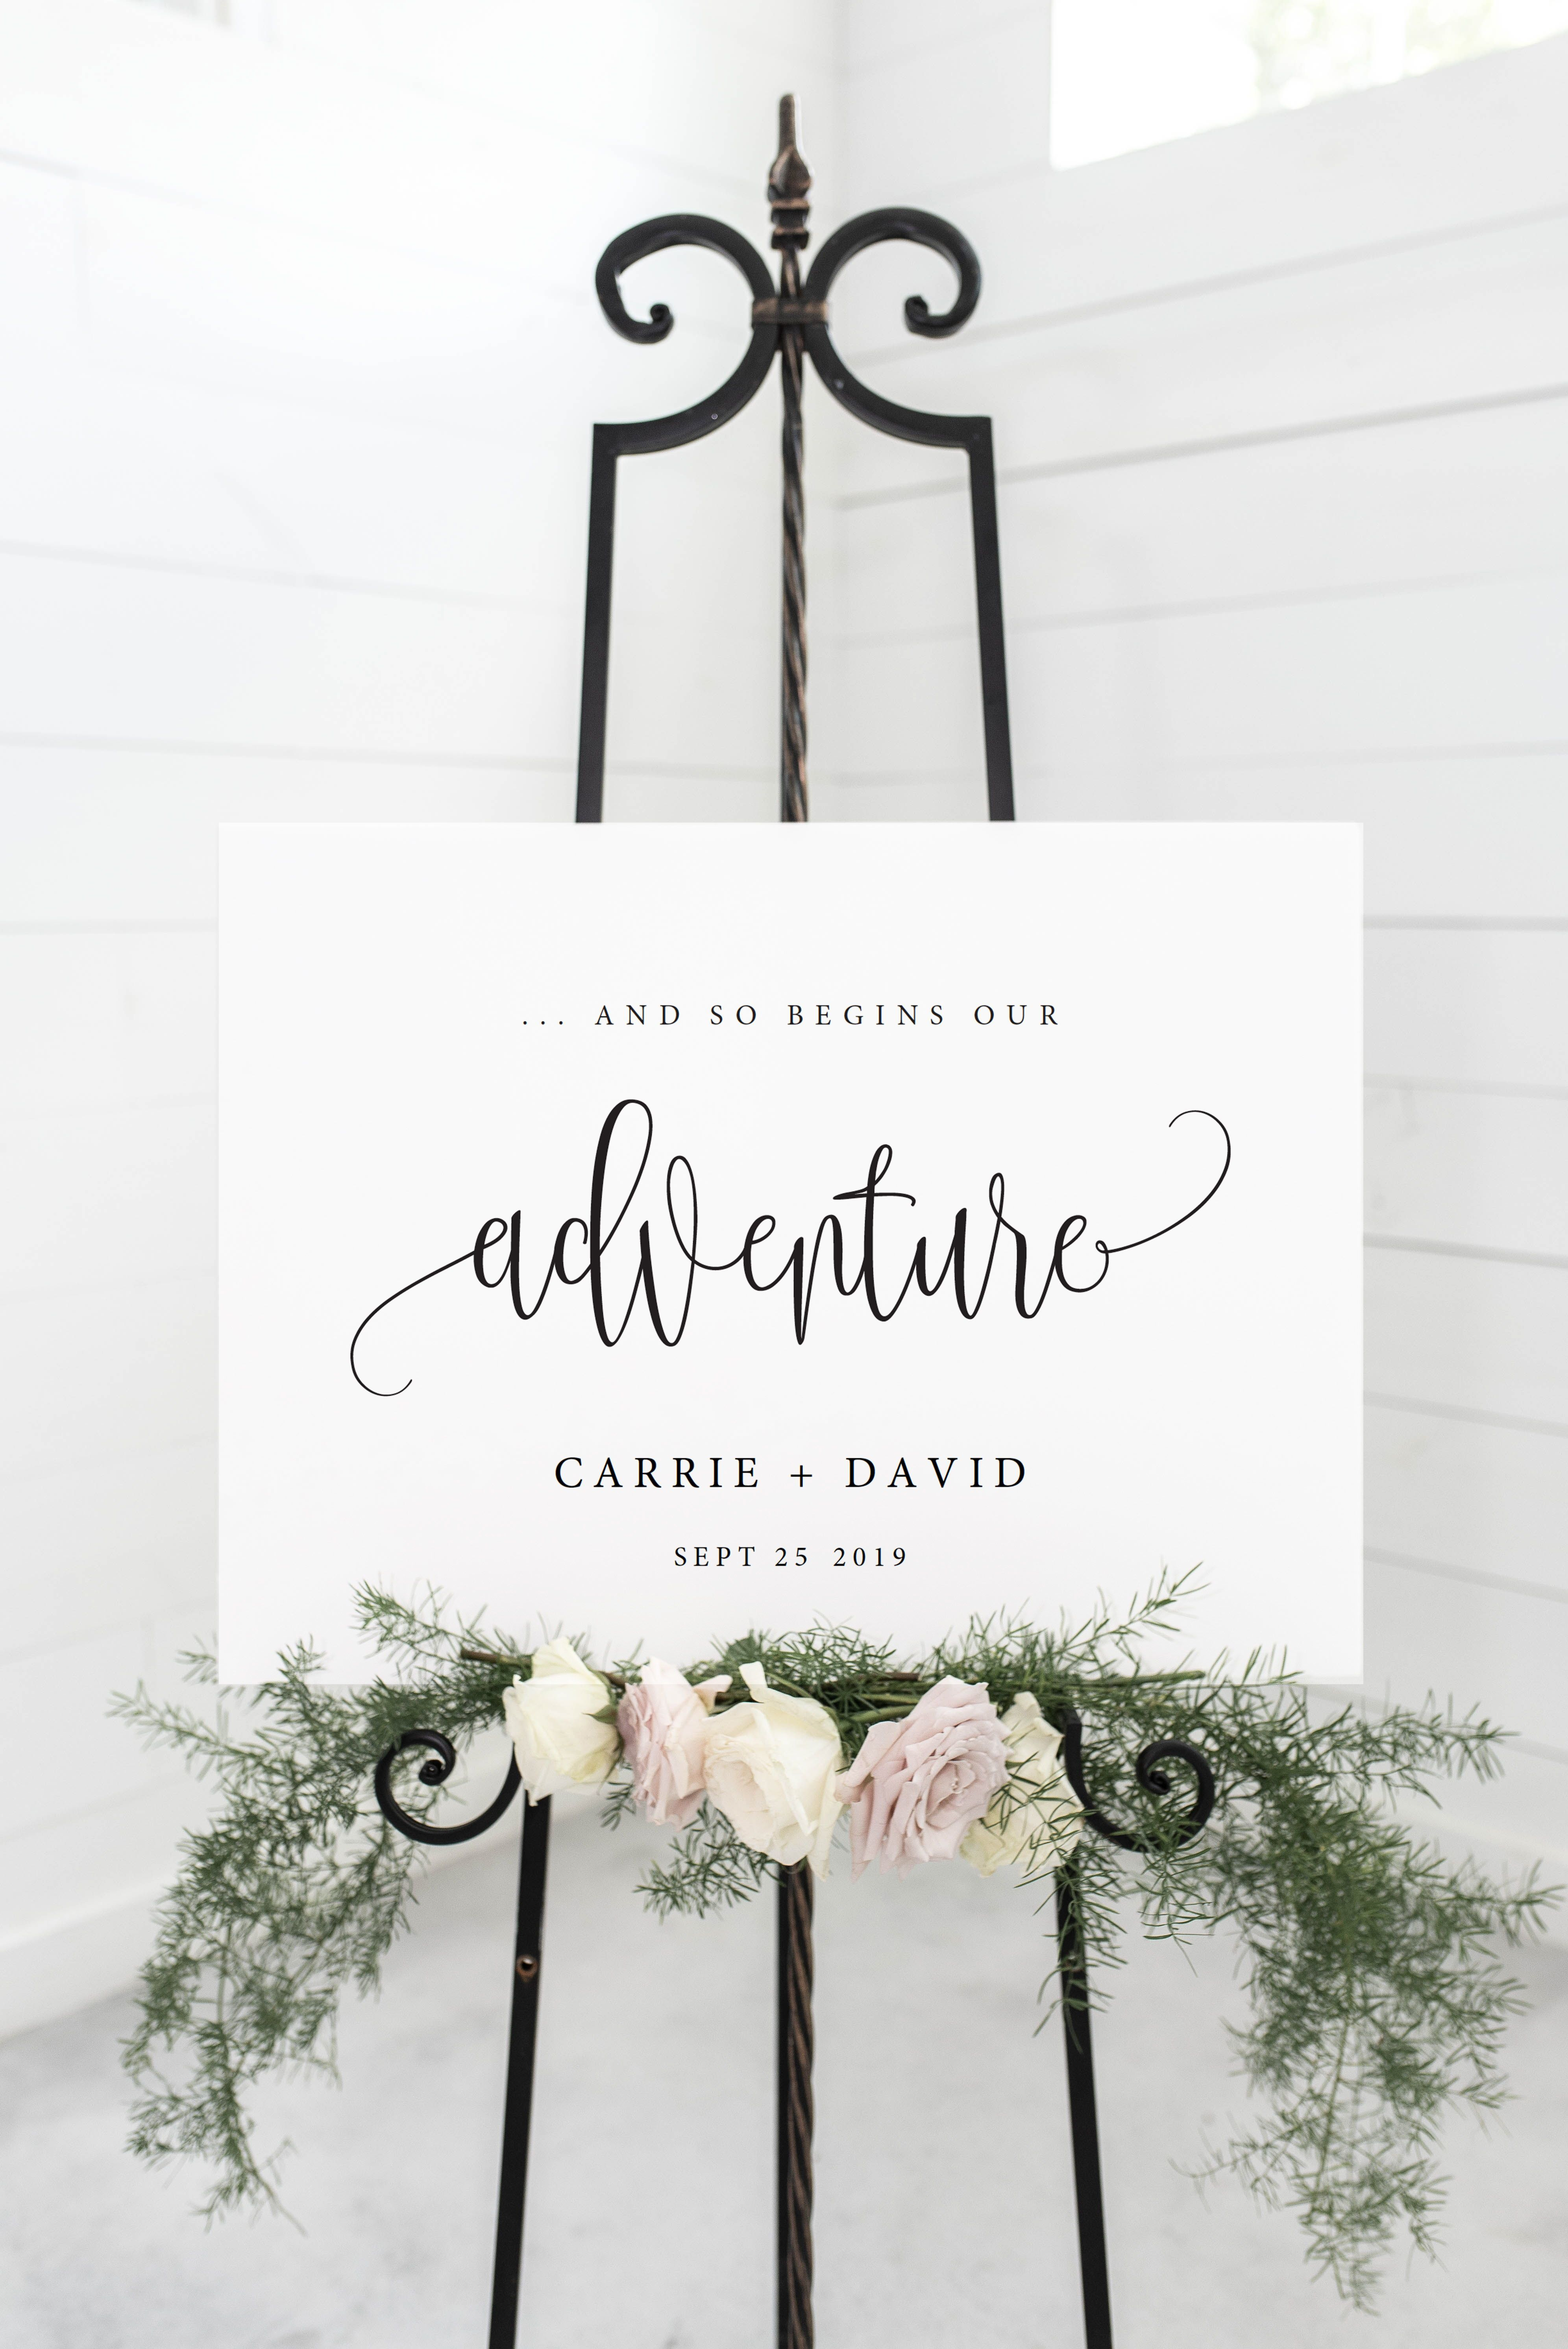 Printable Wedding Signs Invitations Templates And Wedding Table Numbers Wedding Invitations Diy Diy Wedding Invitations Templates Free Wedding Printables